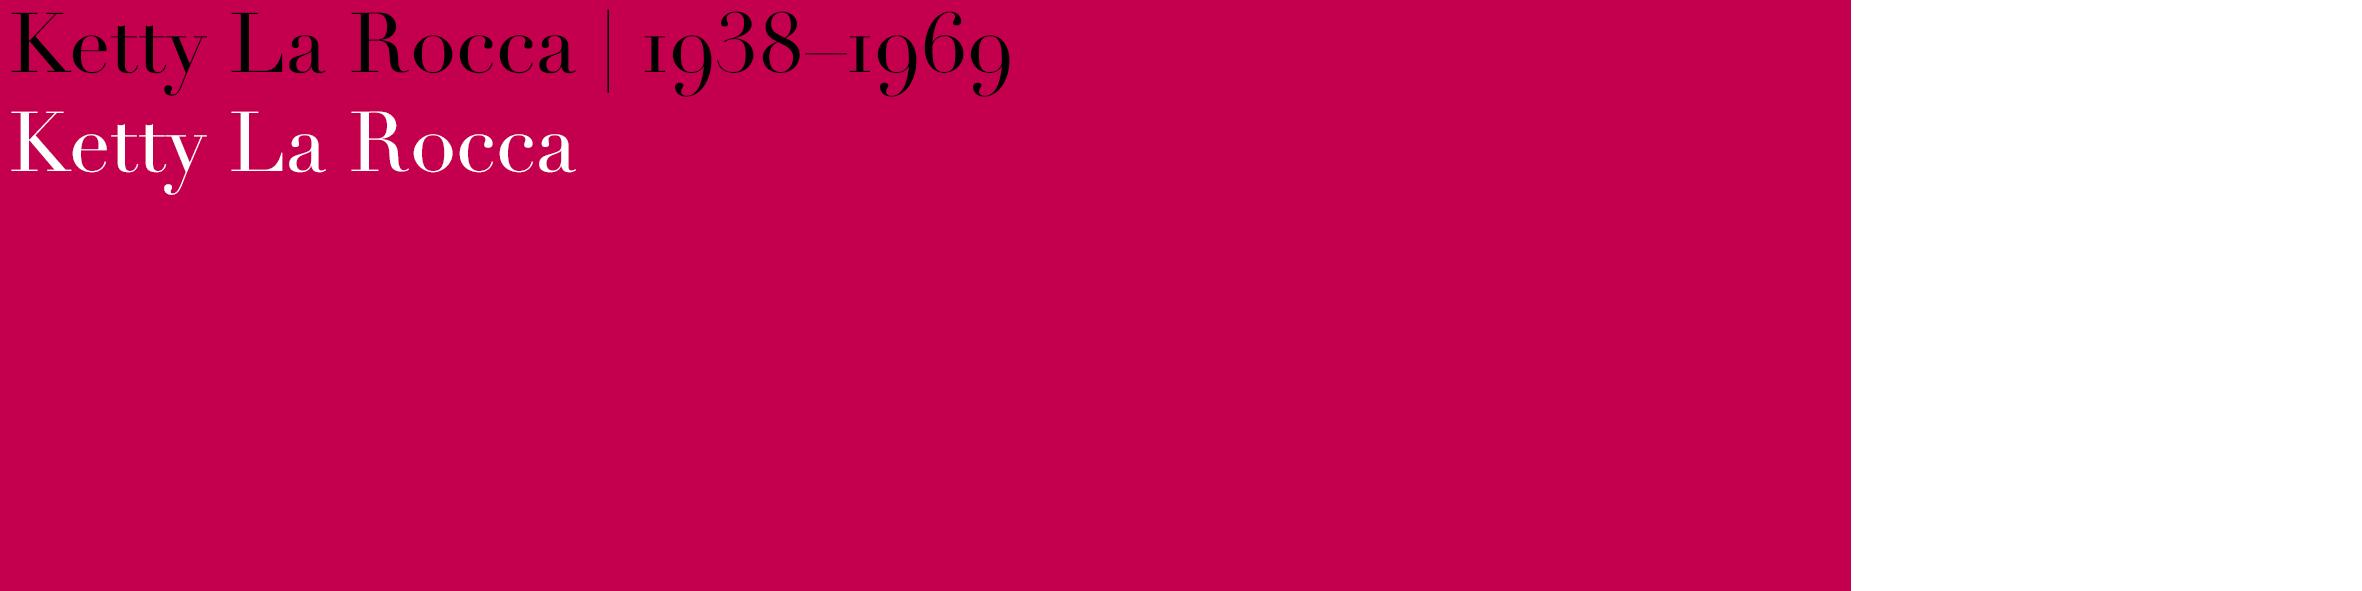 073_KettyLaRocca.png